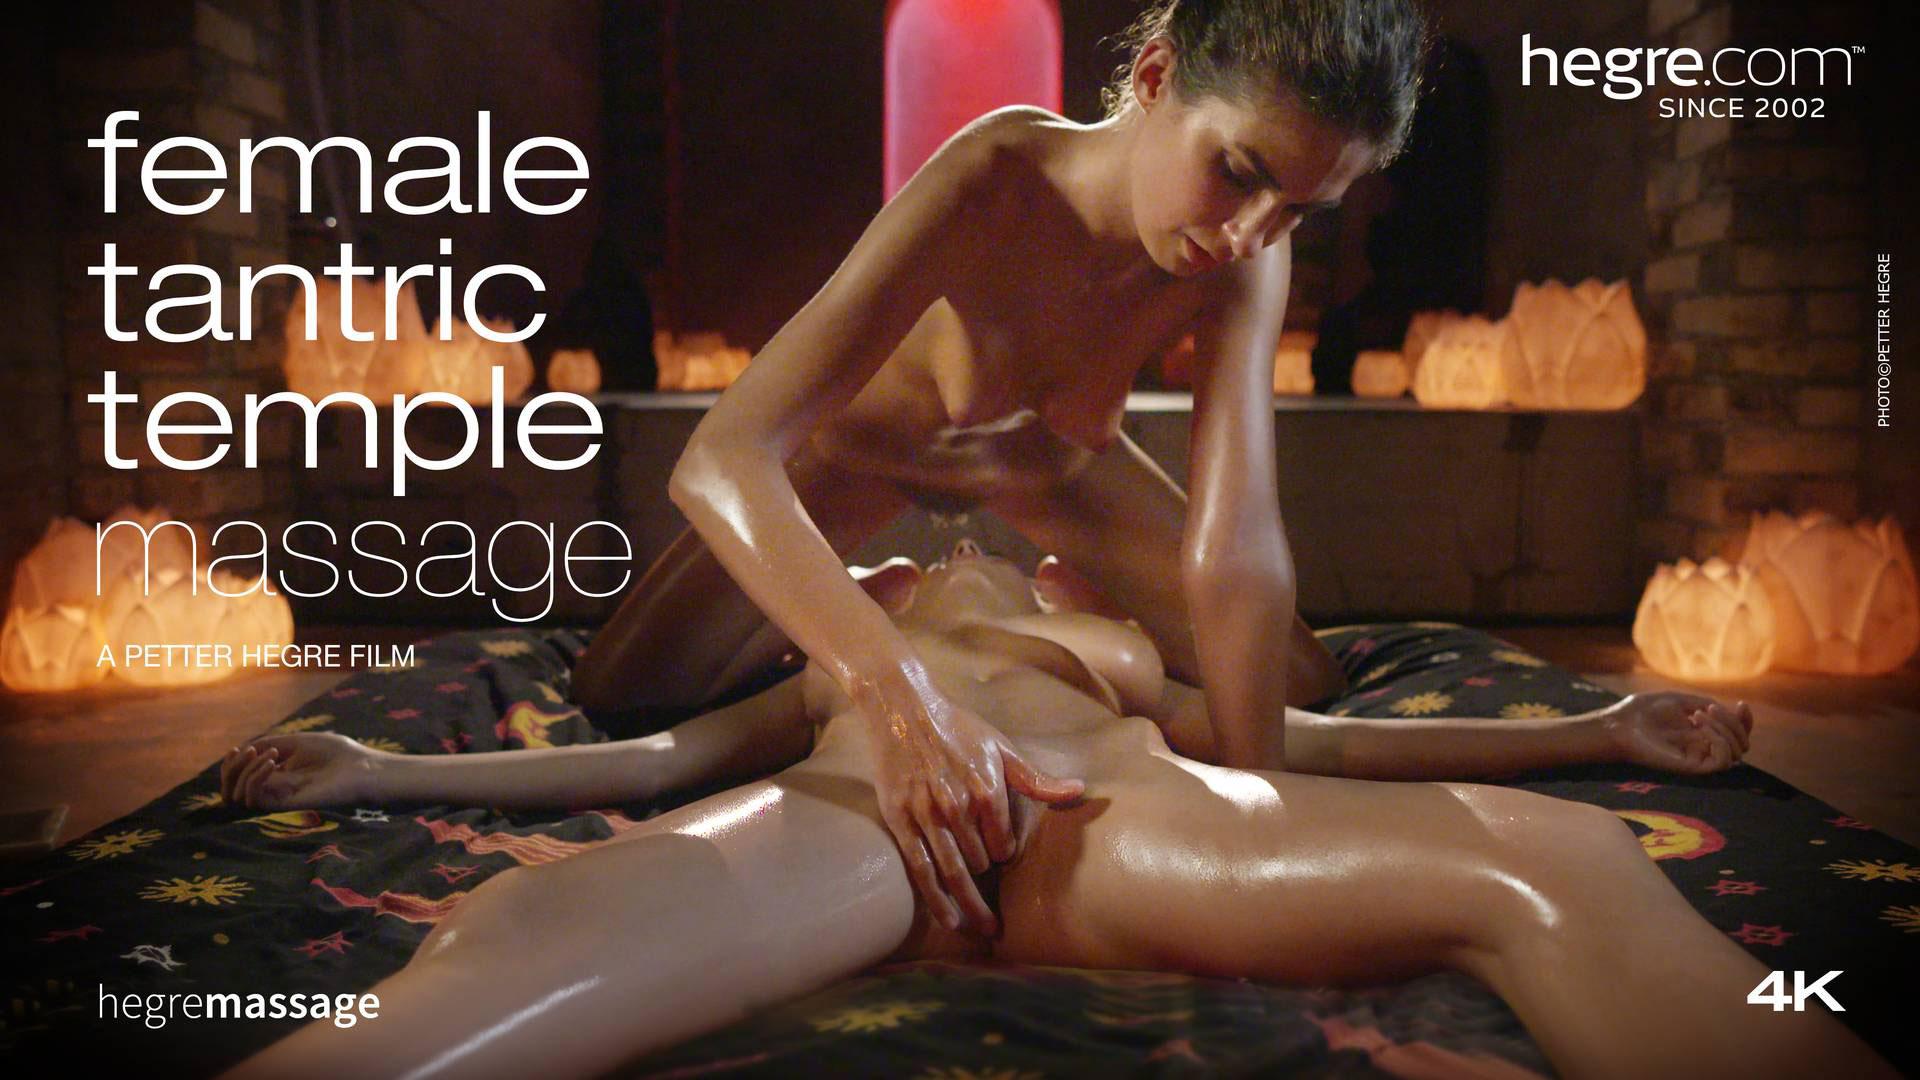 Hegre Massage Films